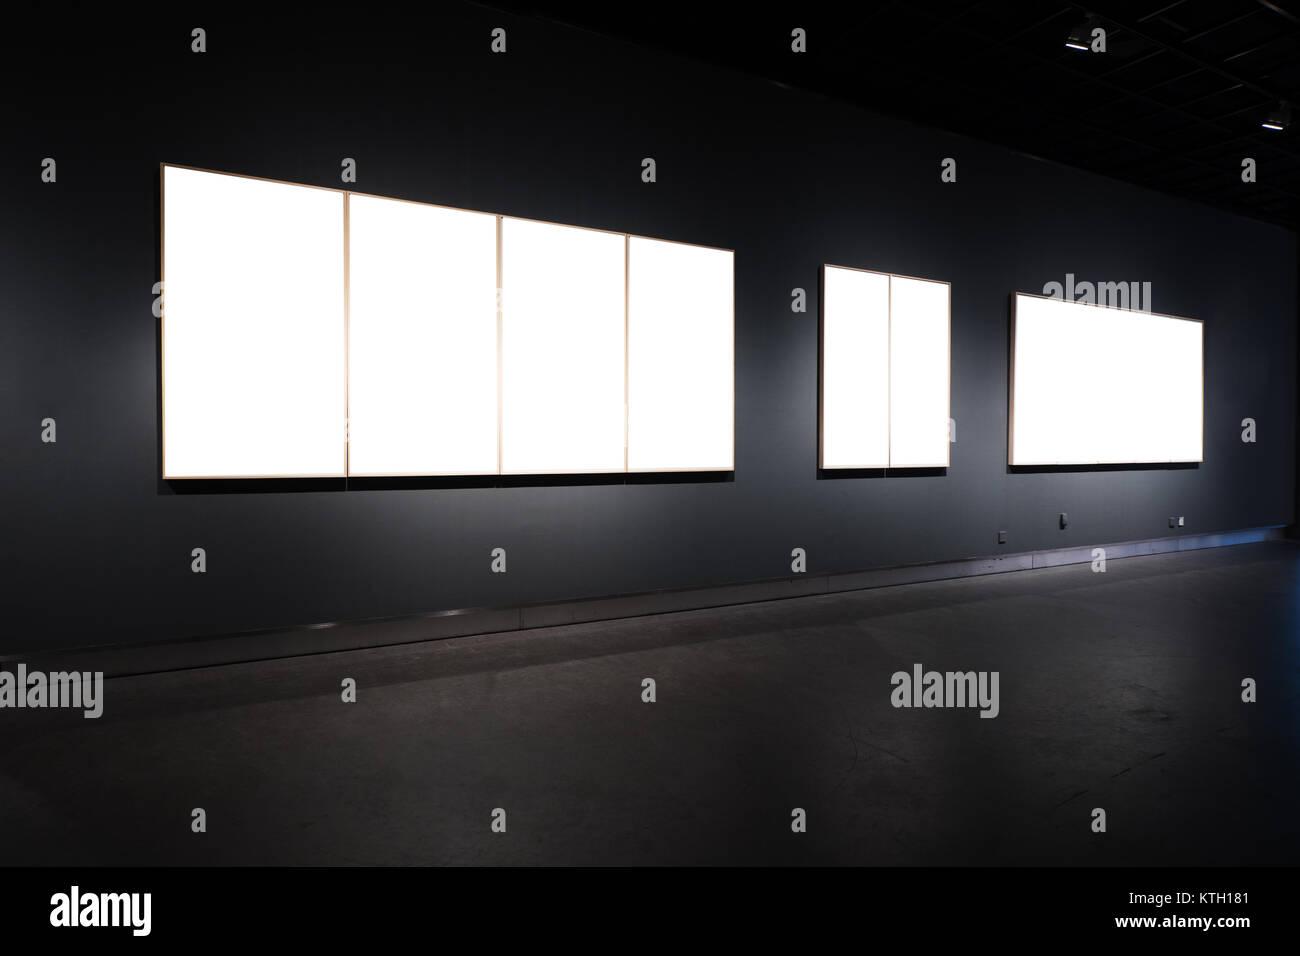 Garage Frames Stock Photos & Garage Frames Stock Images - Alamy